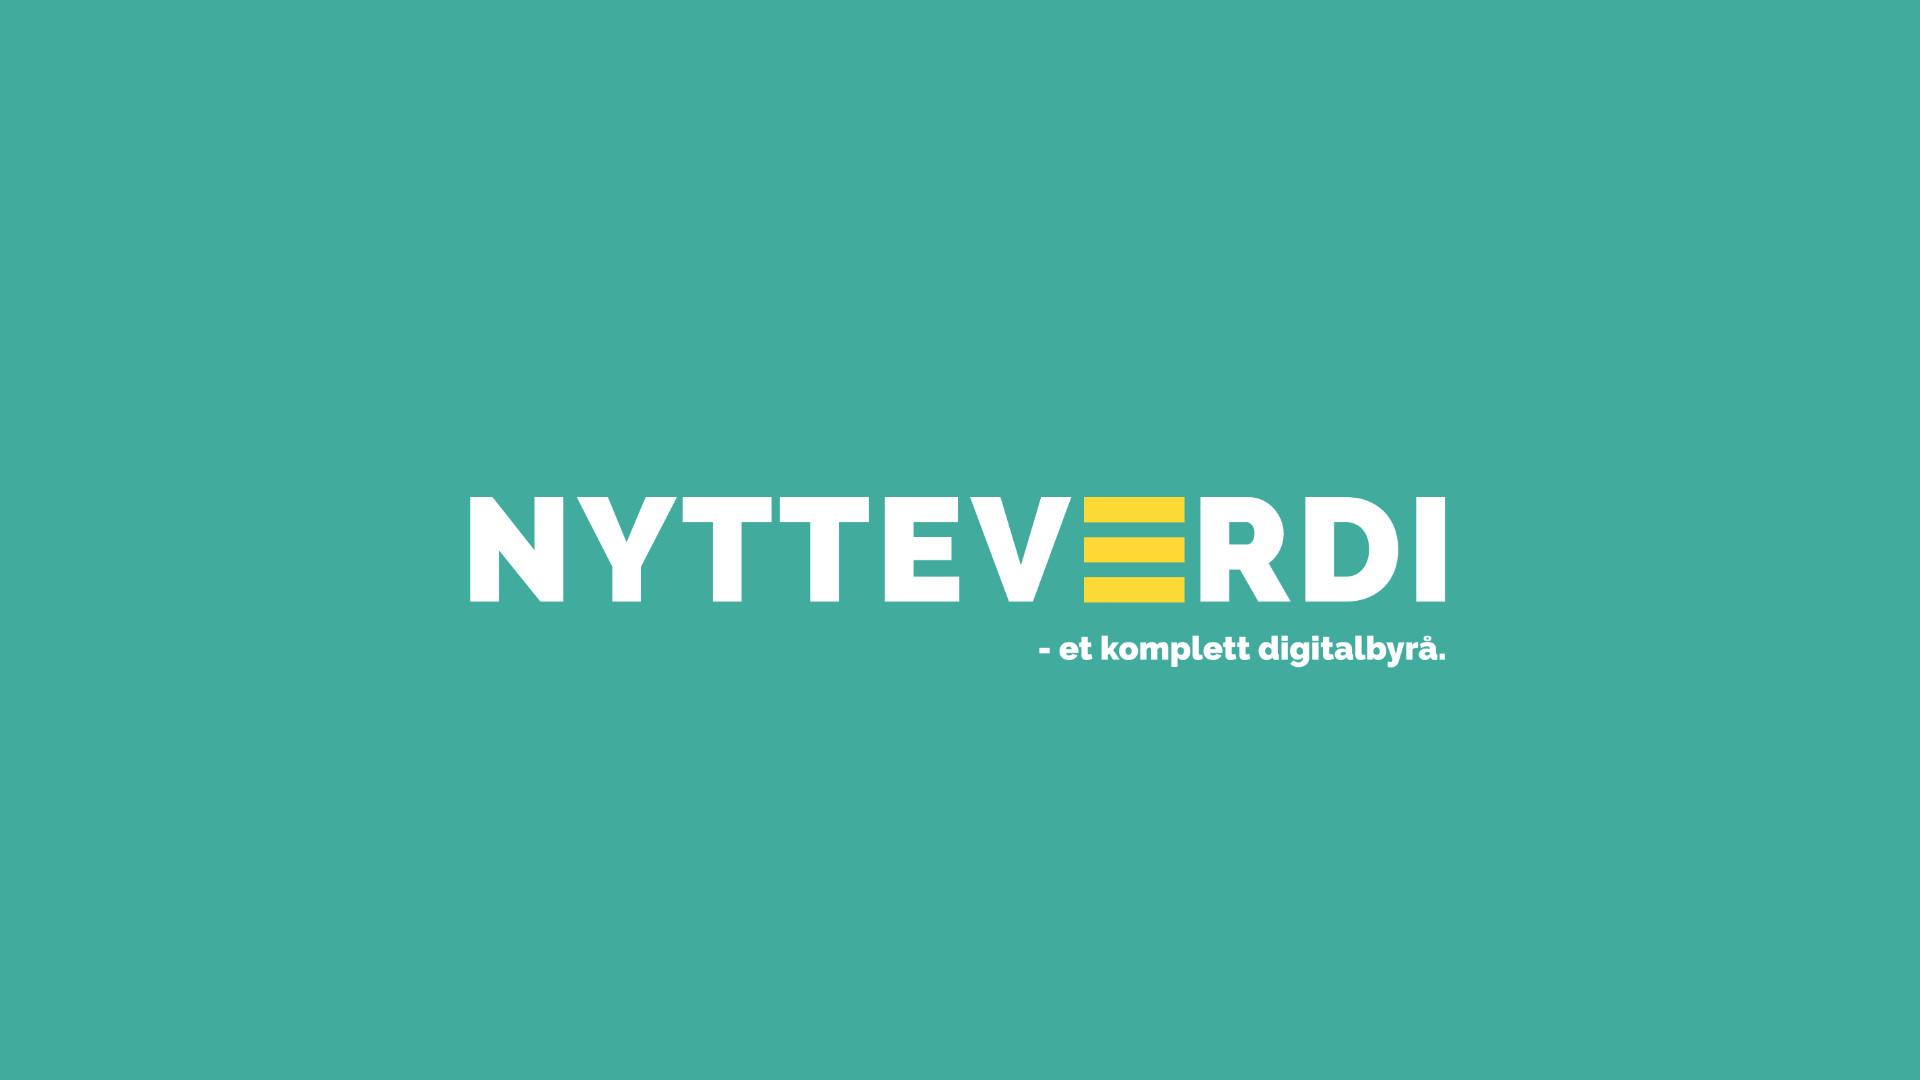 nytteverdi ny logo